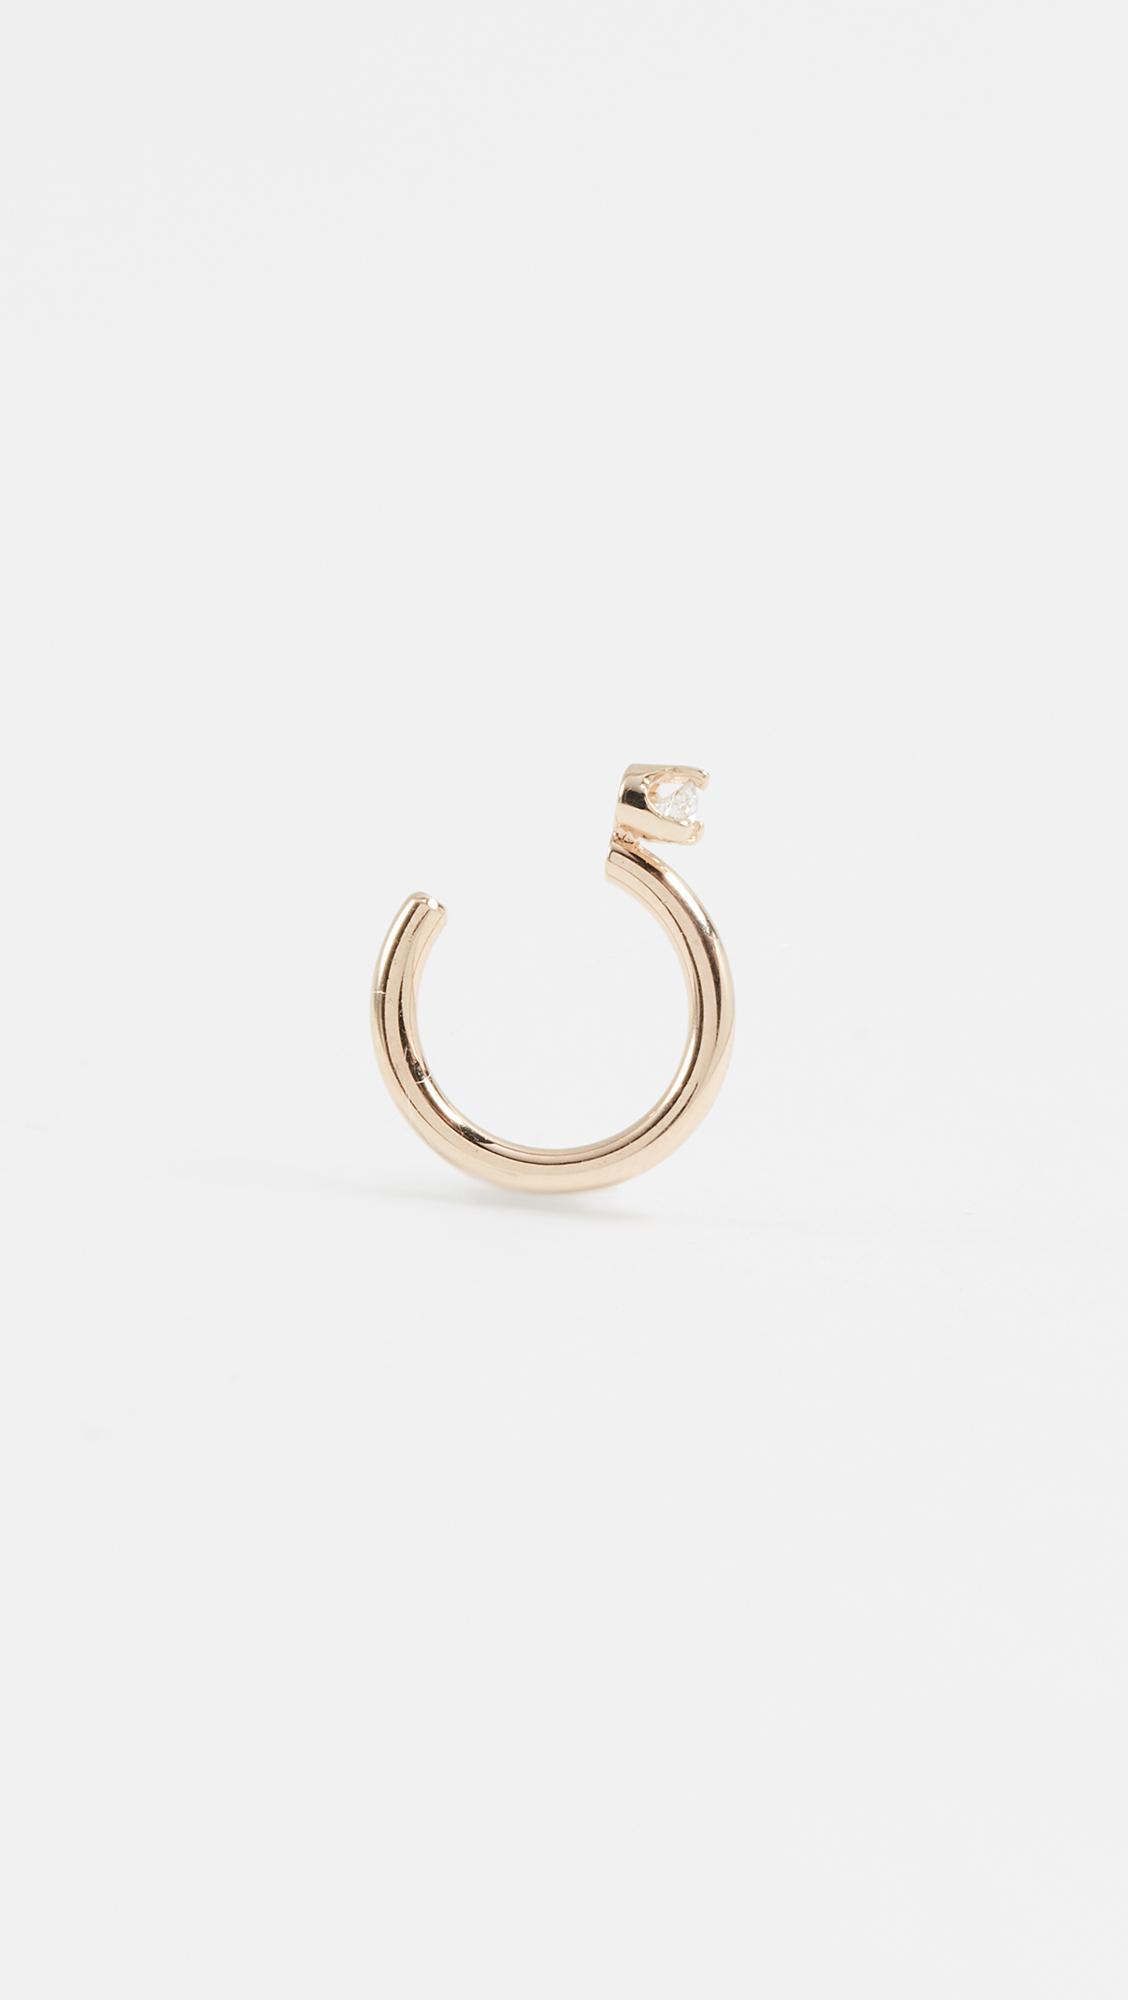 Zoë Chicco 14K Gold Ear Cuff with White Diamond iIyIt